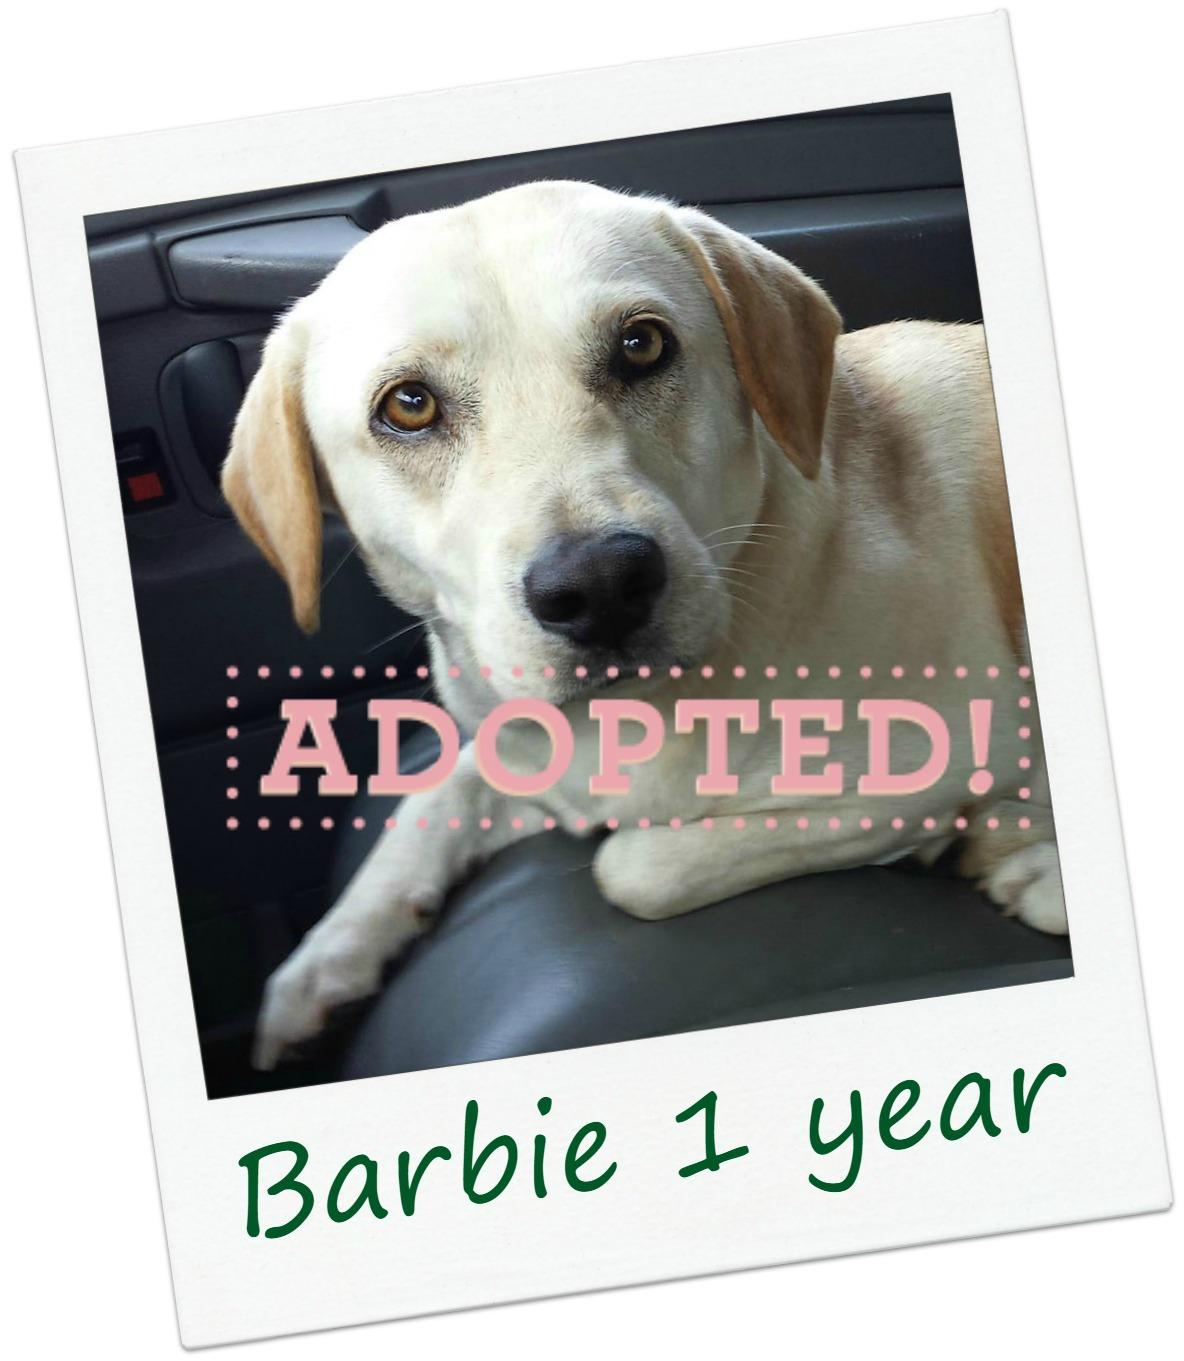 barbie_adopt.jpg